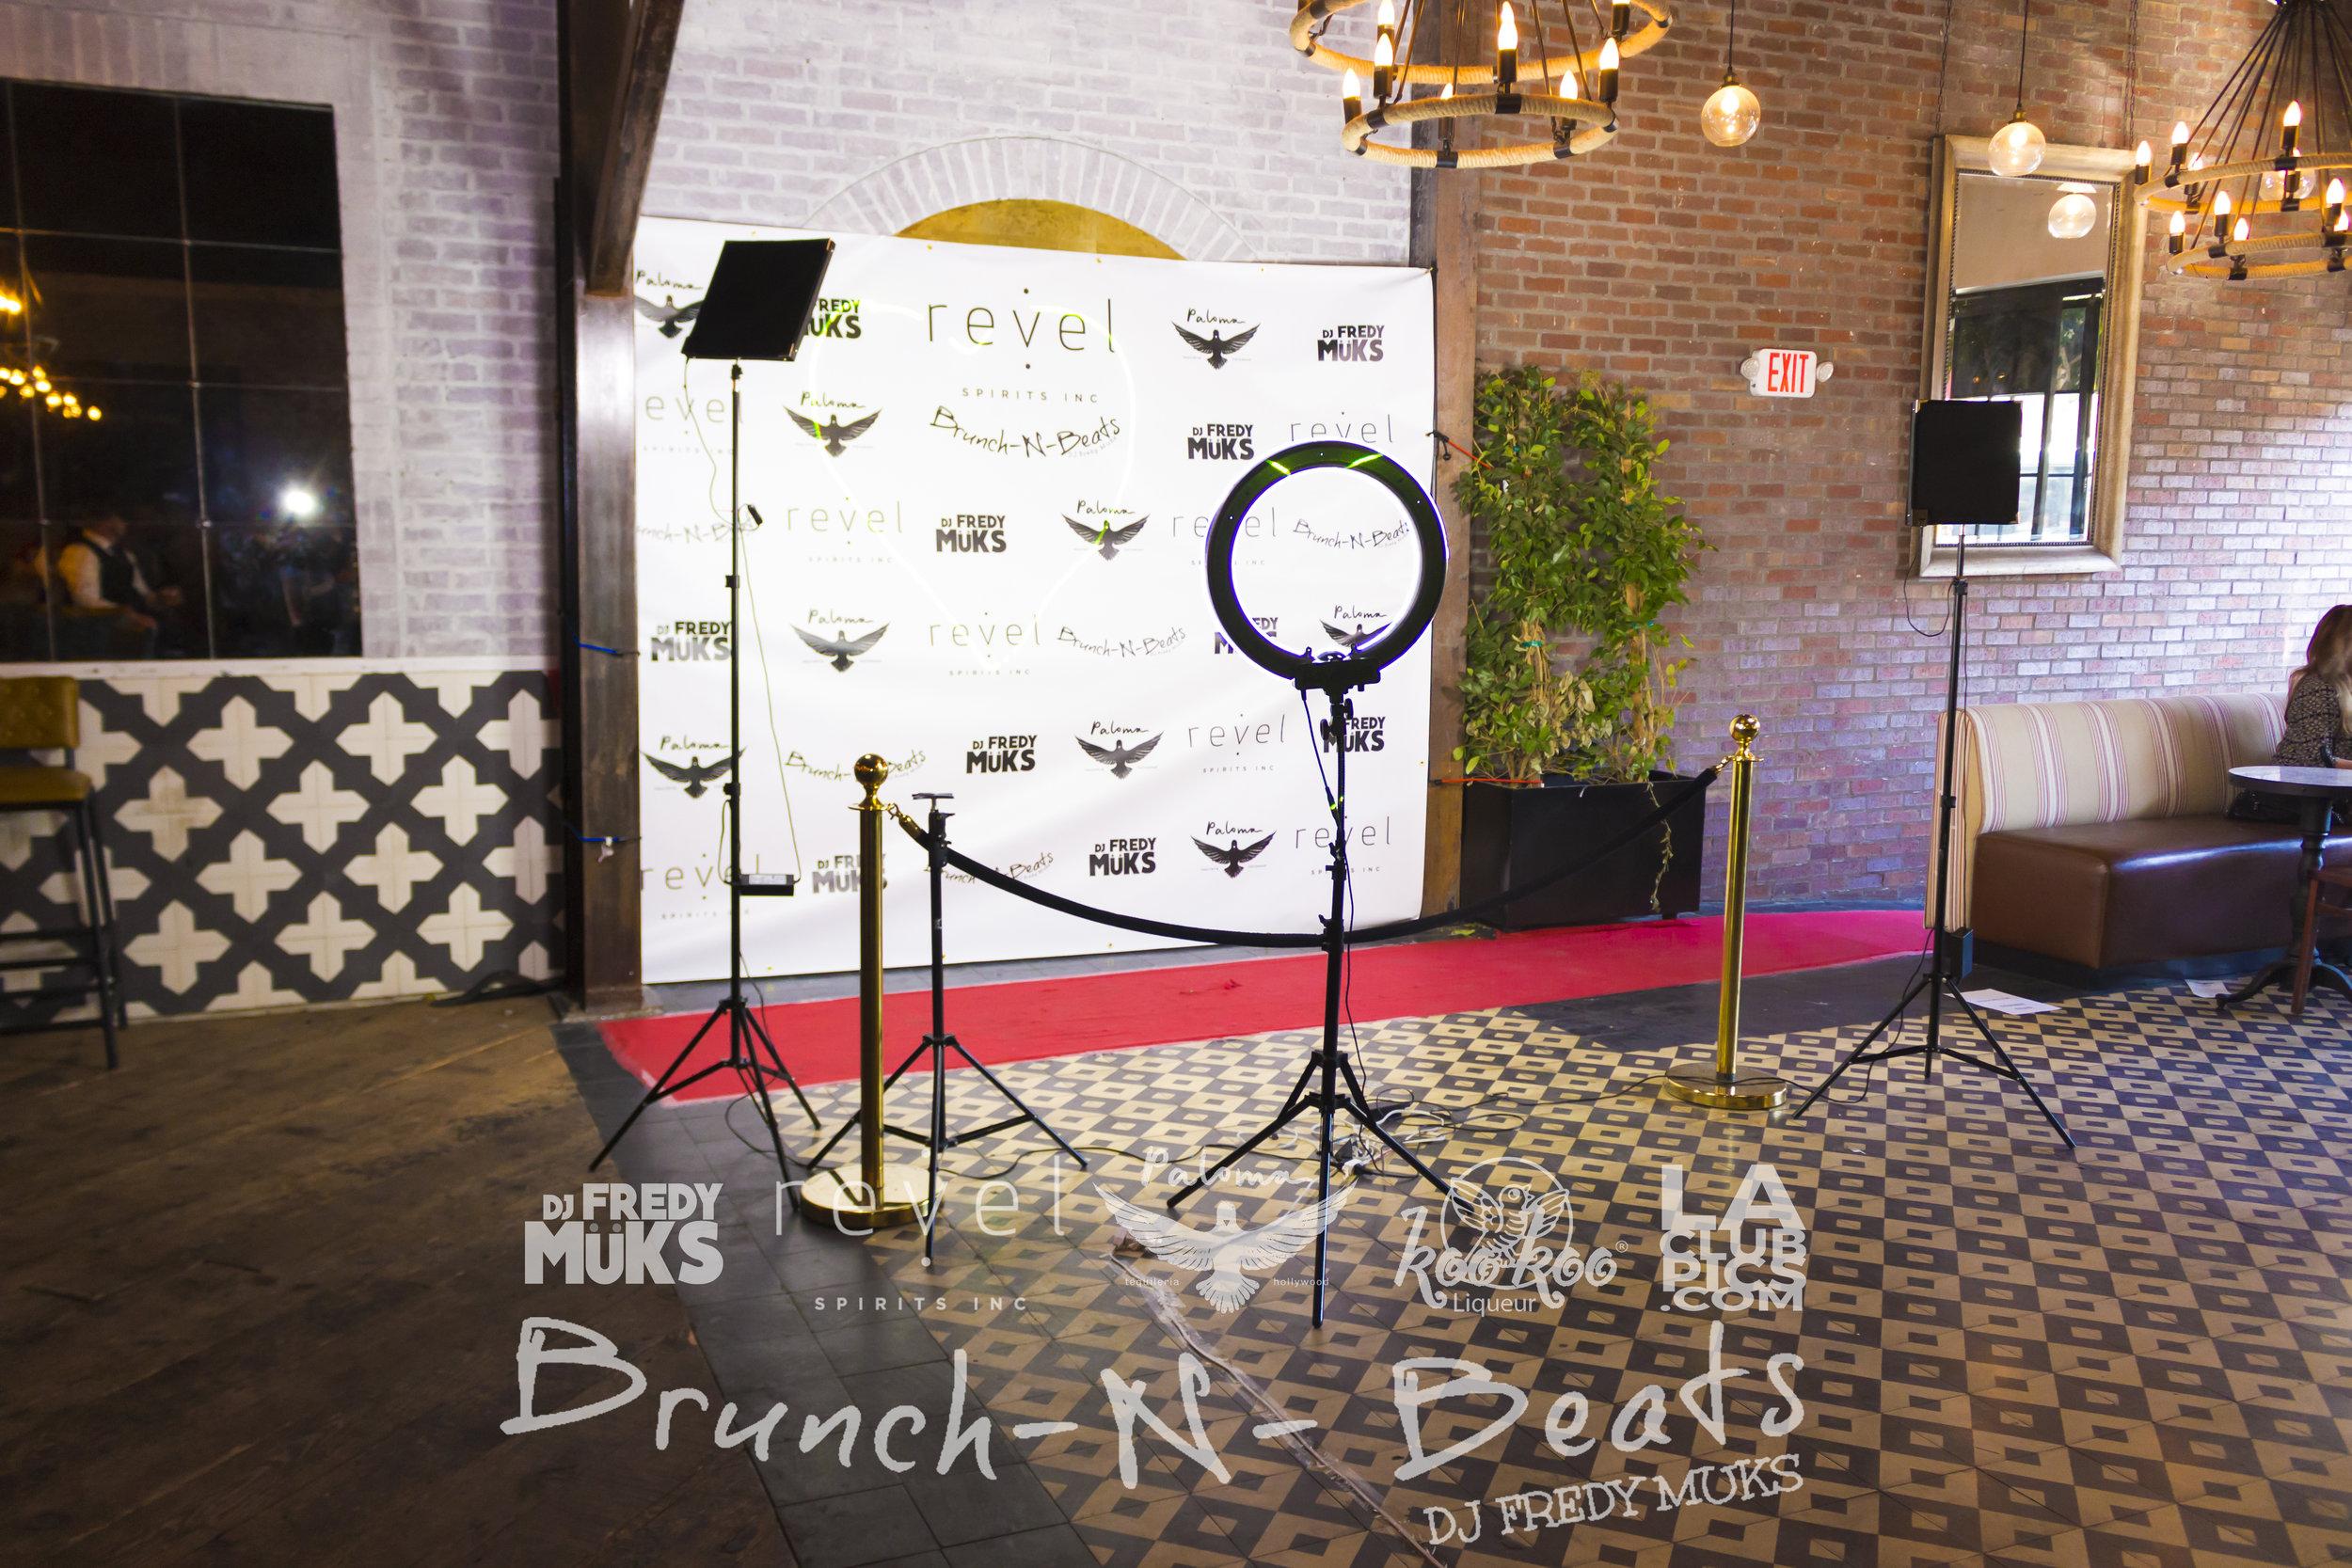 Brunch-N-Beats - Paloma Hollywood - 02-25-18_106.jpg